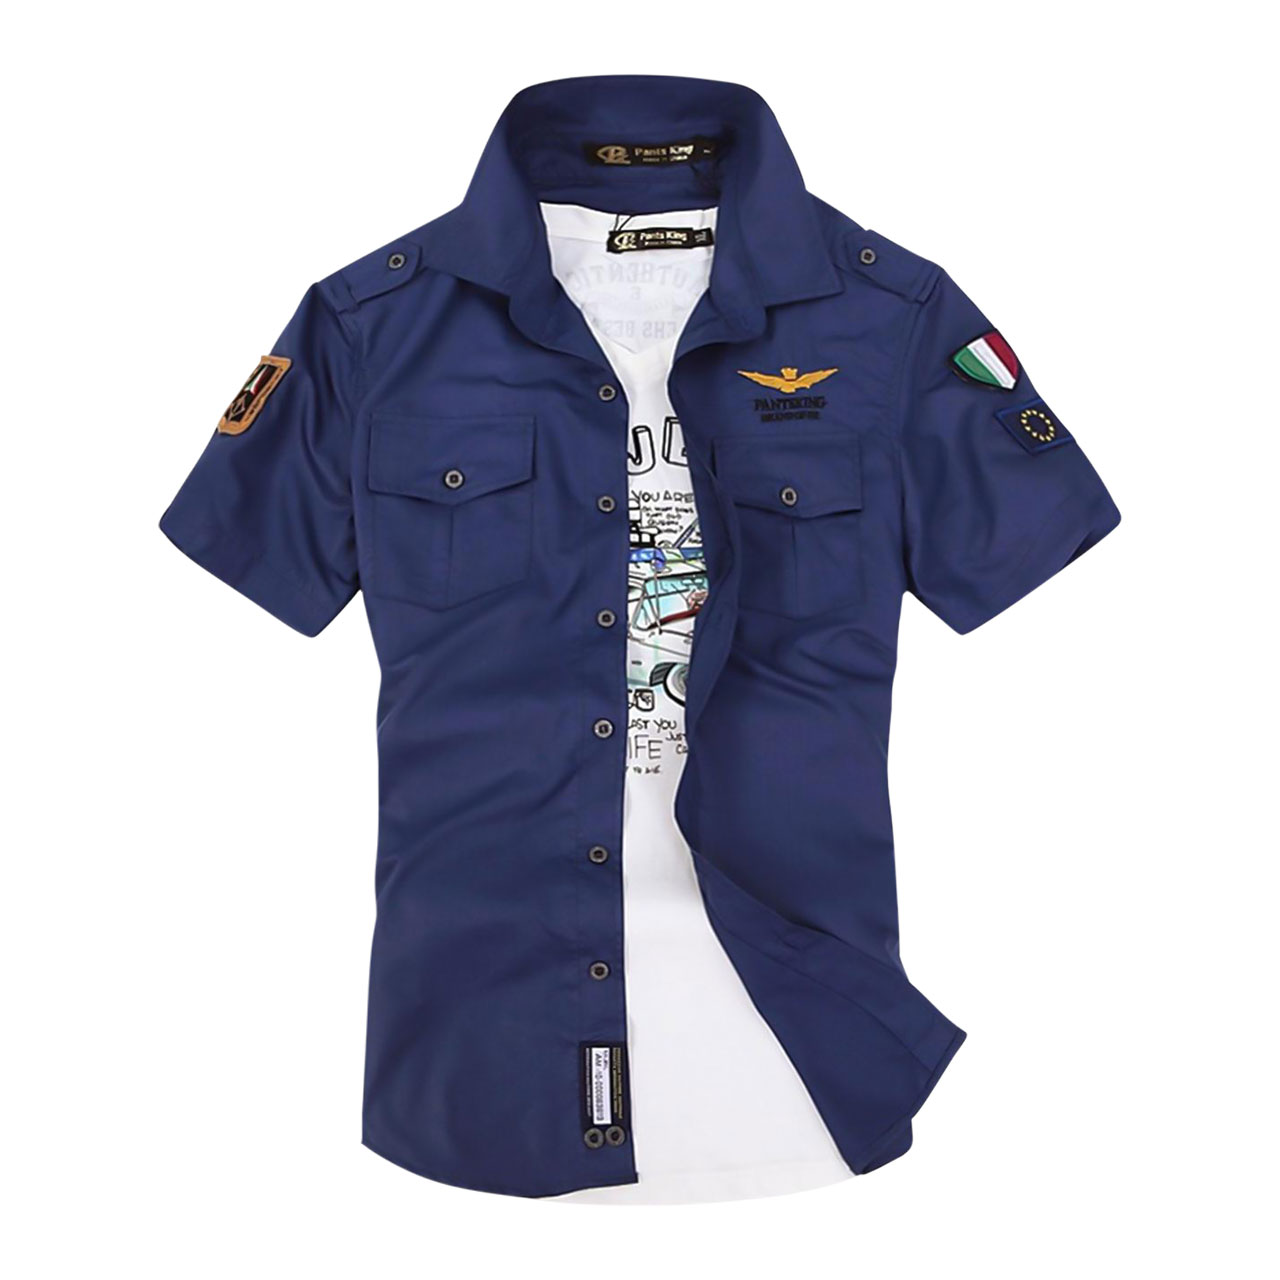 Men's Geometric Slim Shirt Street chic Military Daily Blue Sleeveless